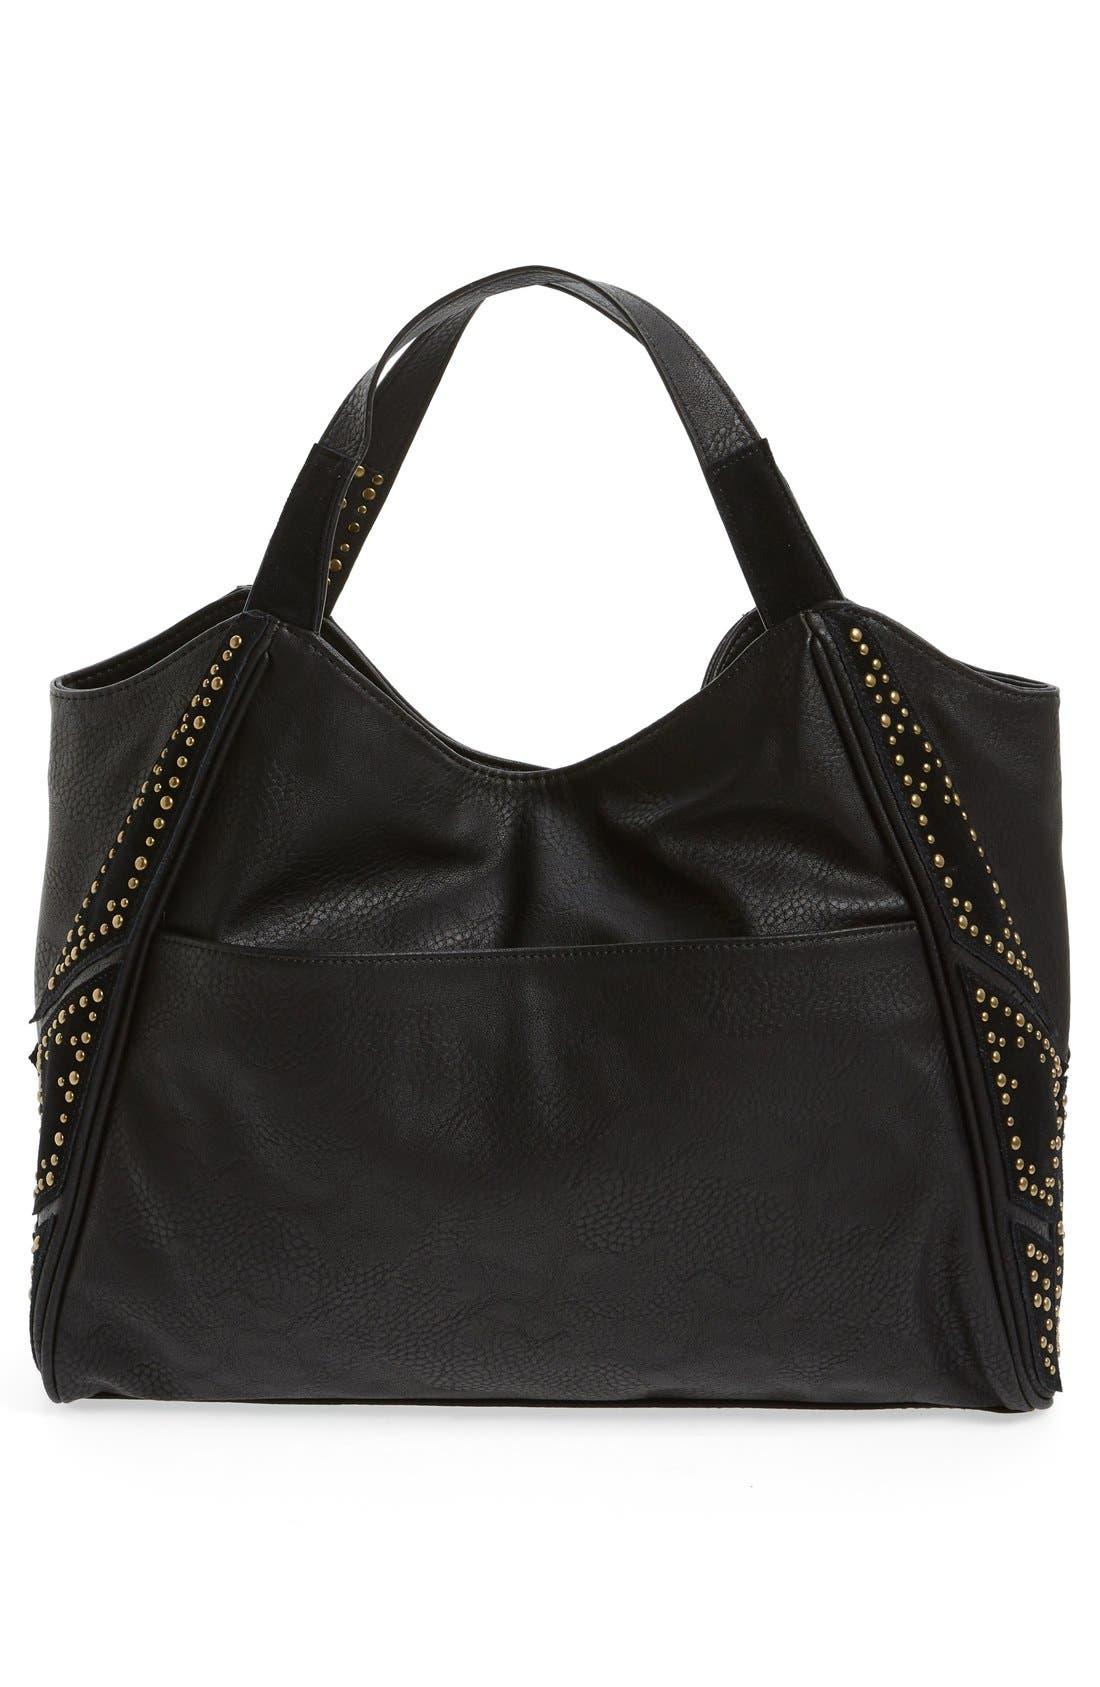 'Jlora' Studded Hobo Bag,                             Alternate thumbnail 2, color,                             Black